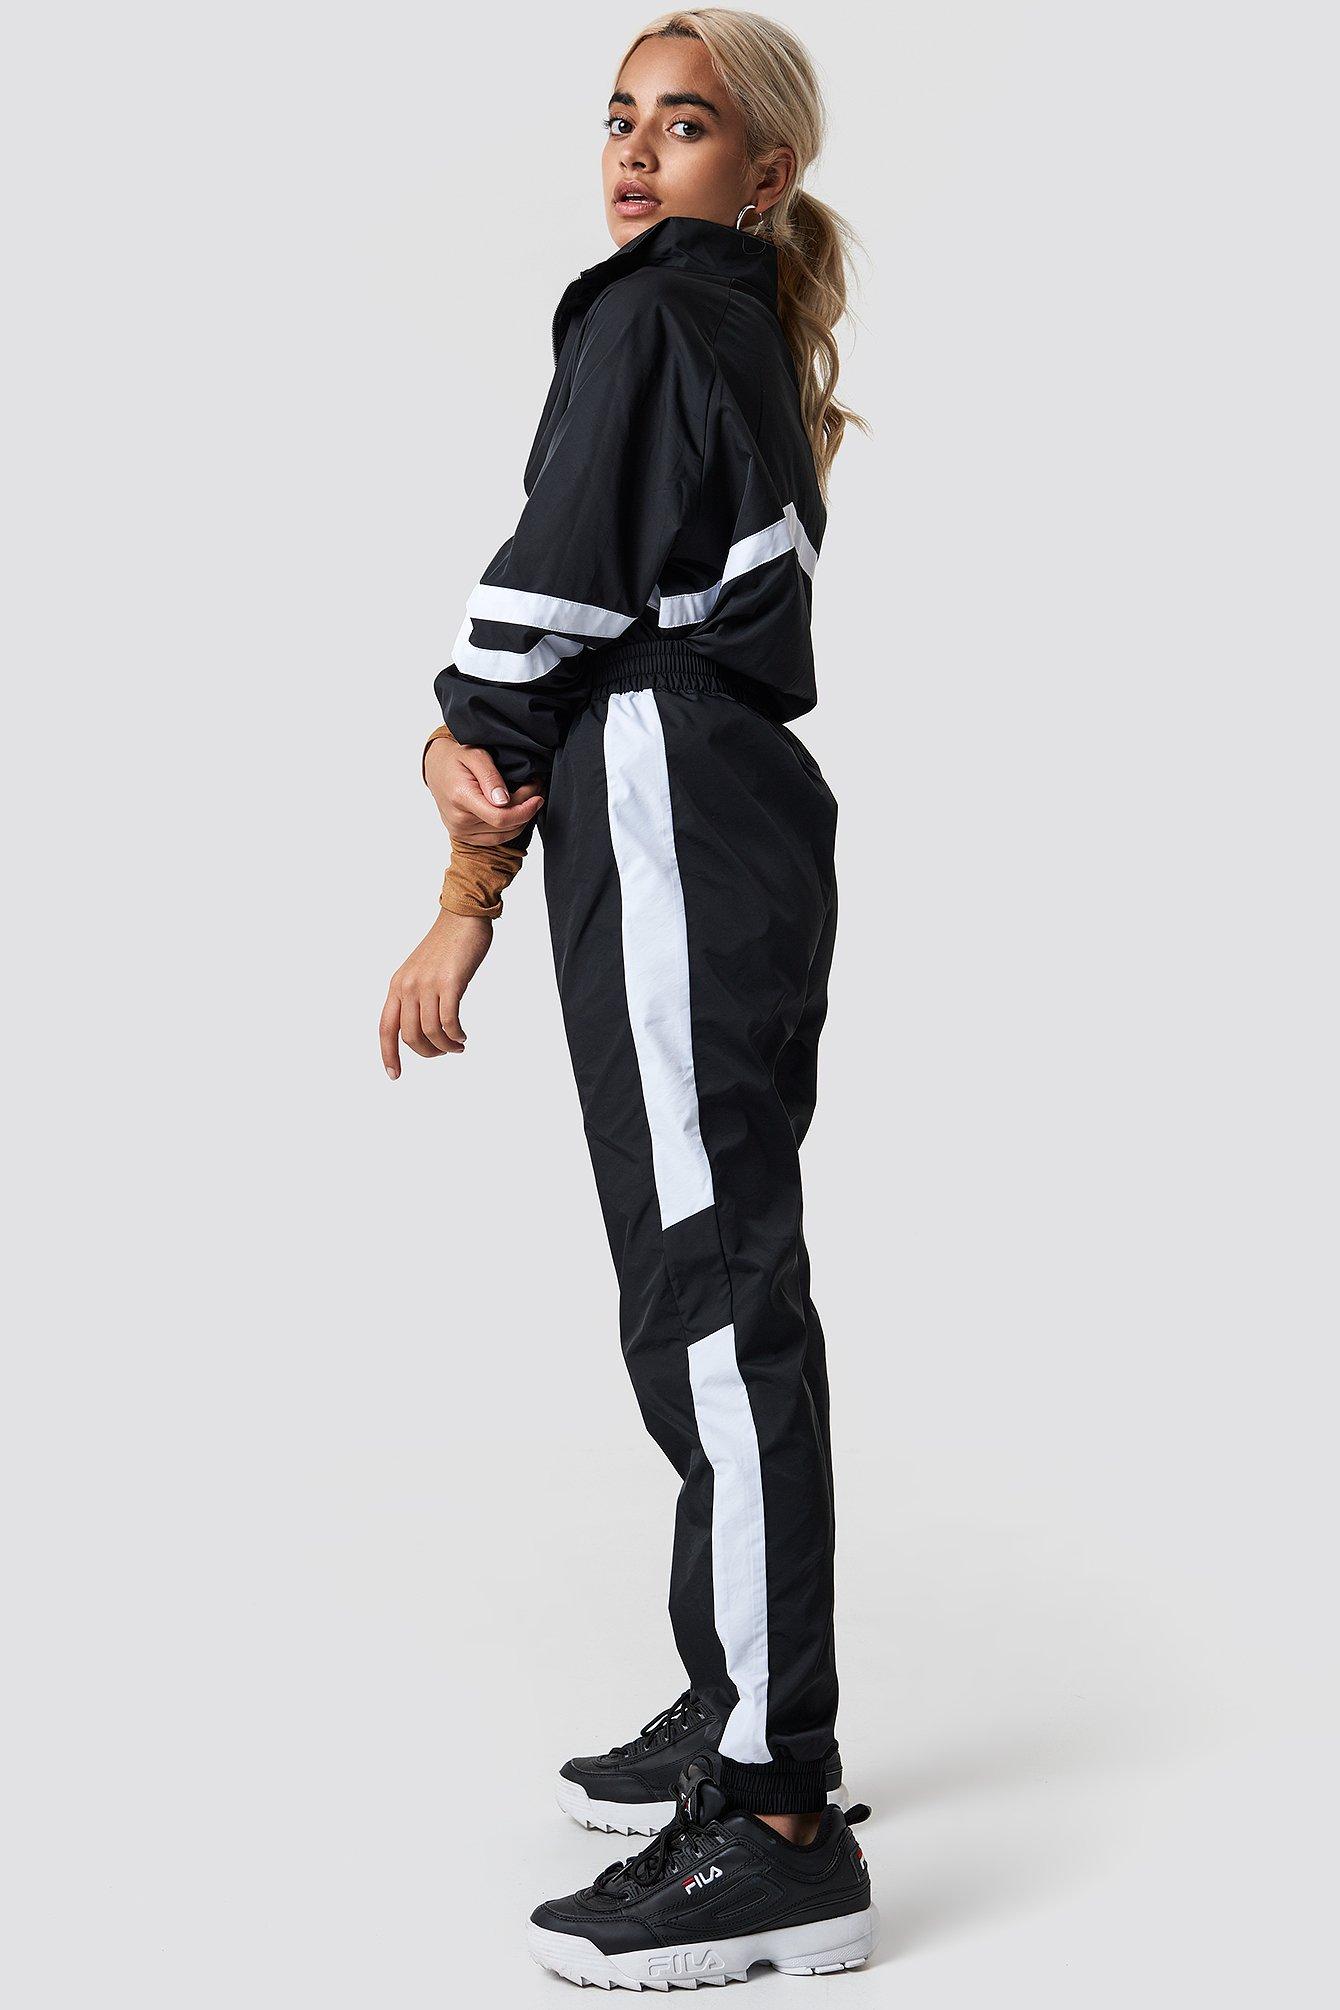 NA-KD Side Stripe Tracksuit Pants - Black | Sportbekleidung > Sportanzüge > Trainingsanzüge | NA-KD